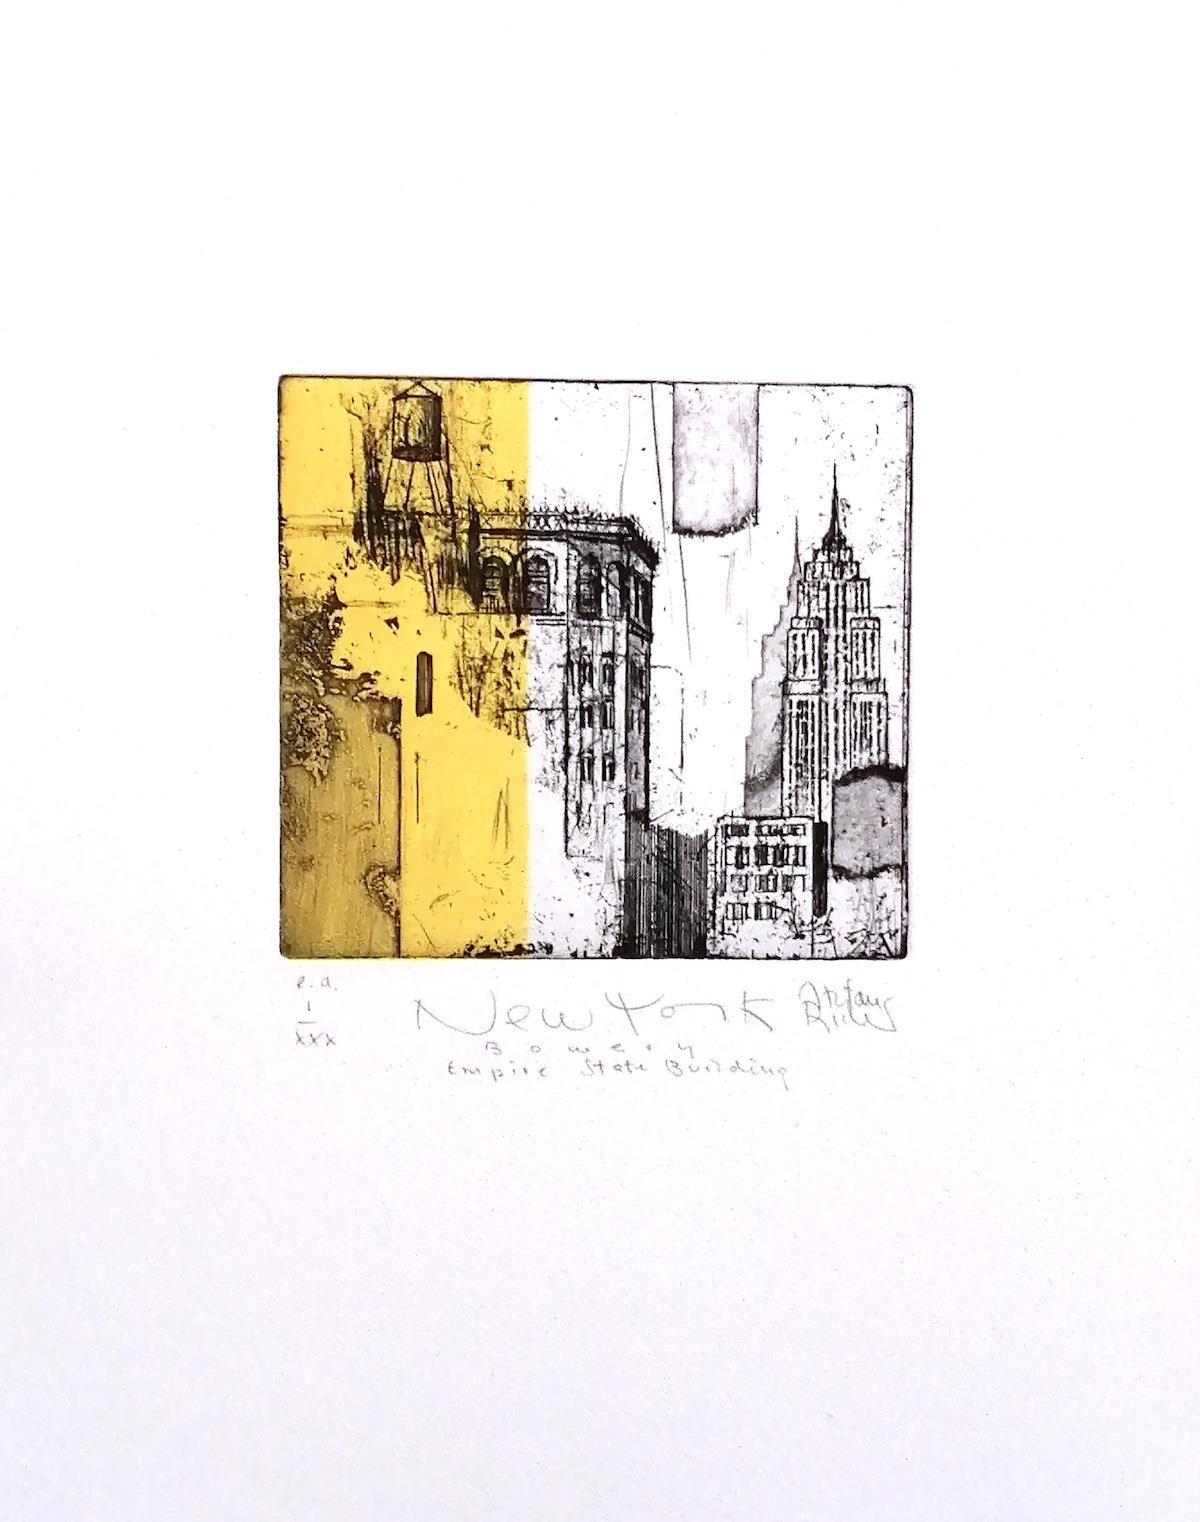 New York Bowery Empire State Buildung - Becker, Stefan - k-Stb411